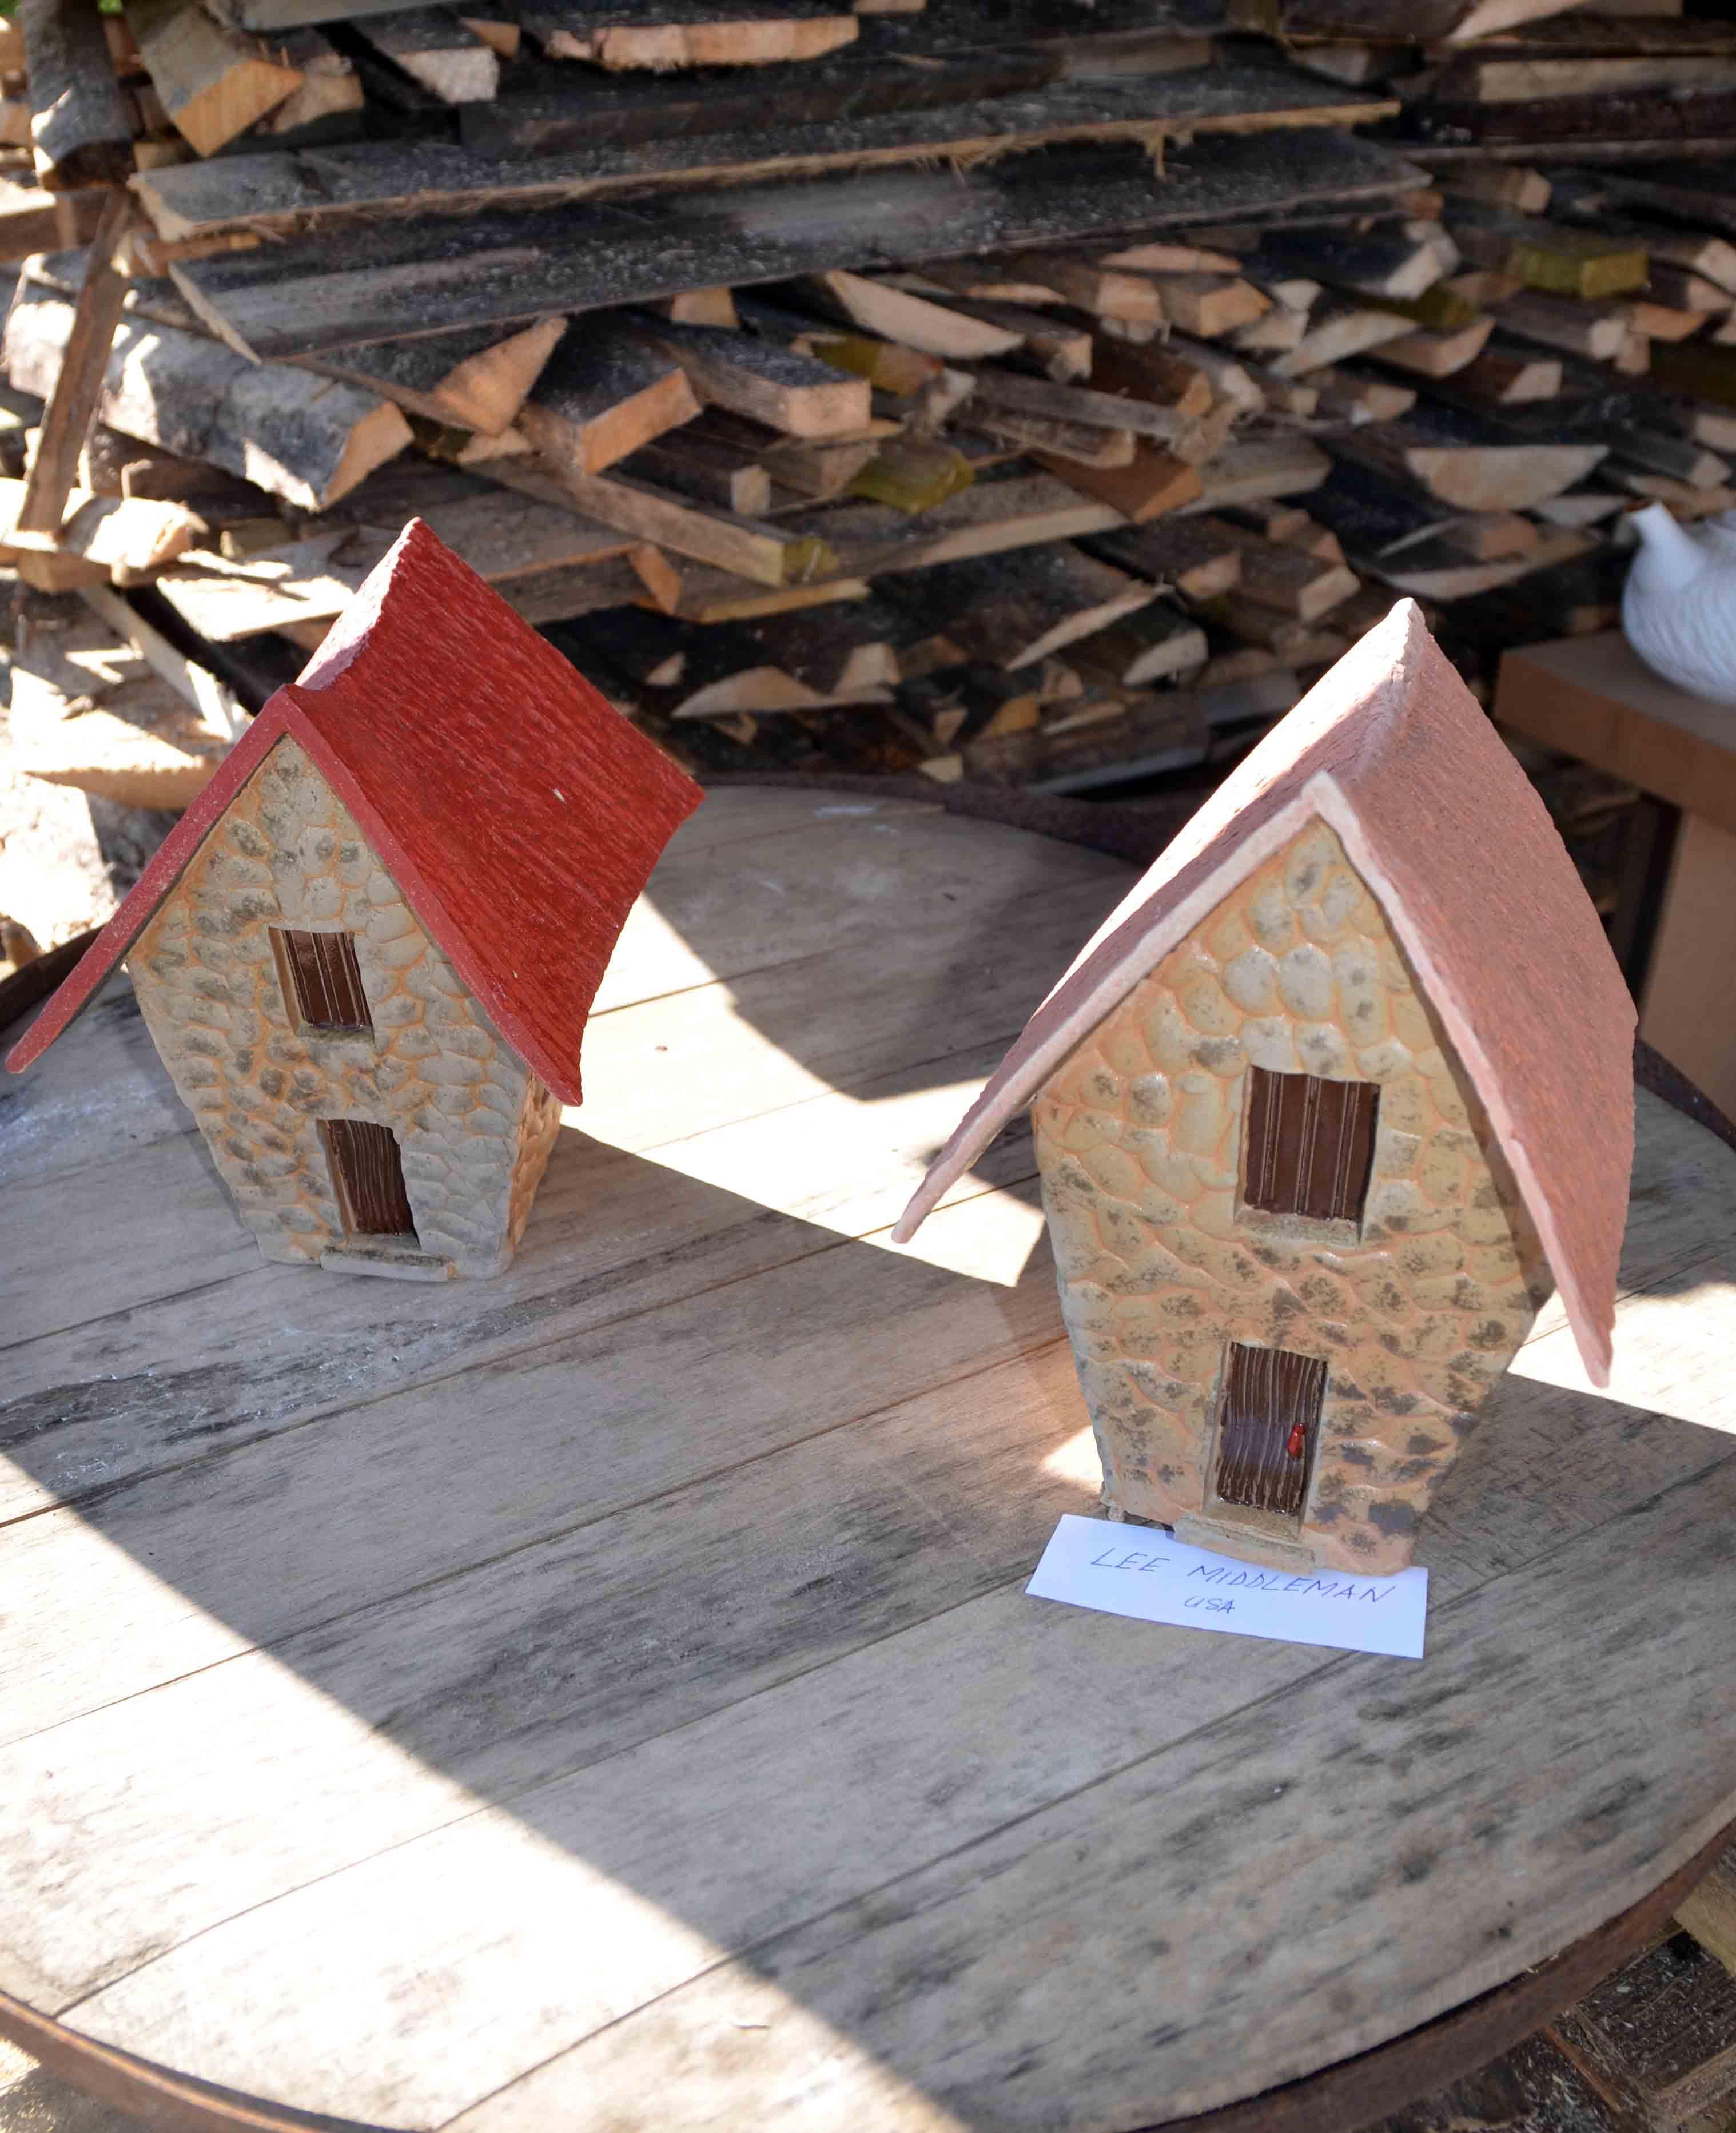 Plemenitaš:  Lee Middletown autor je ovih lijepih skulptura kućica / Snimio Marinko KRMPOTIĆ